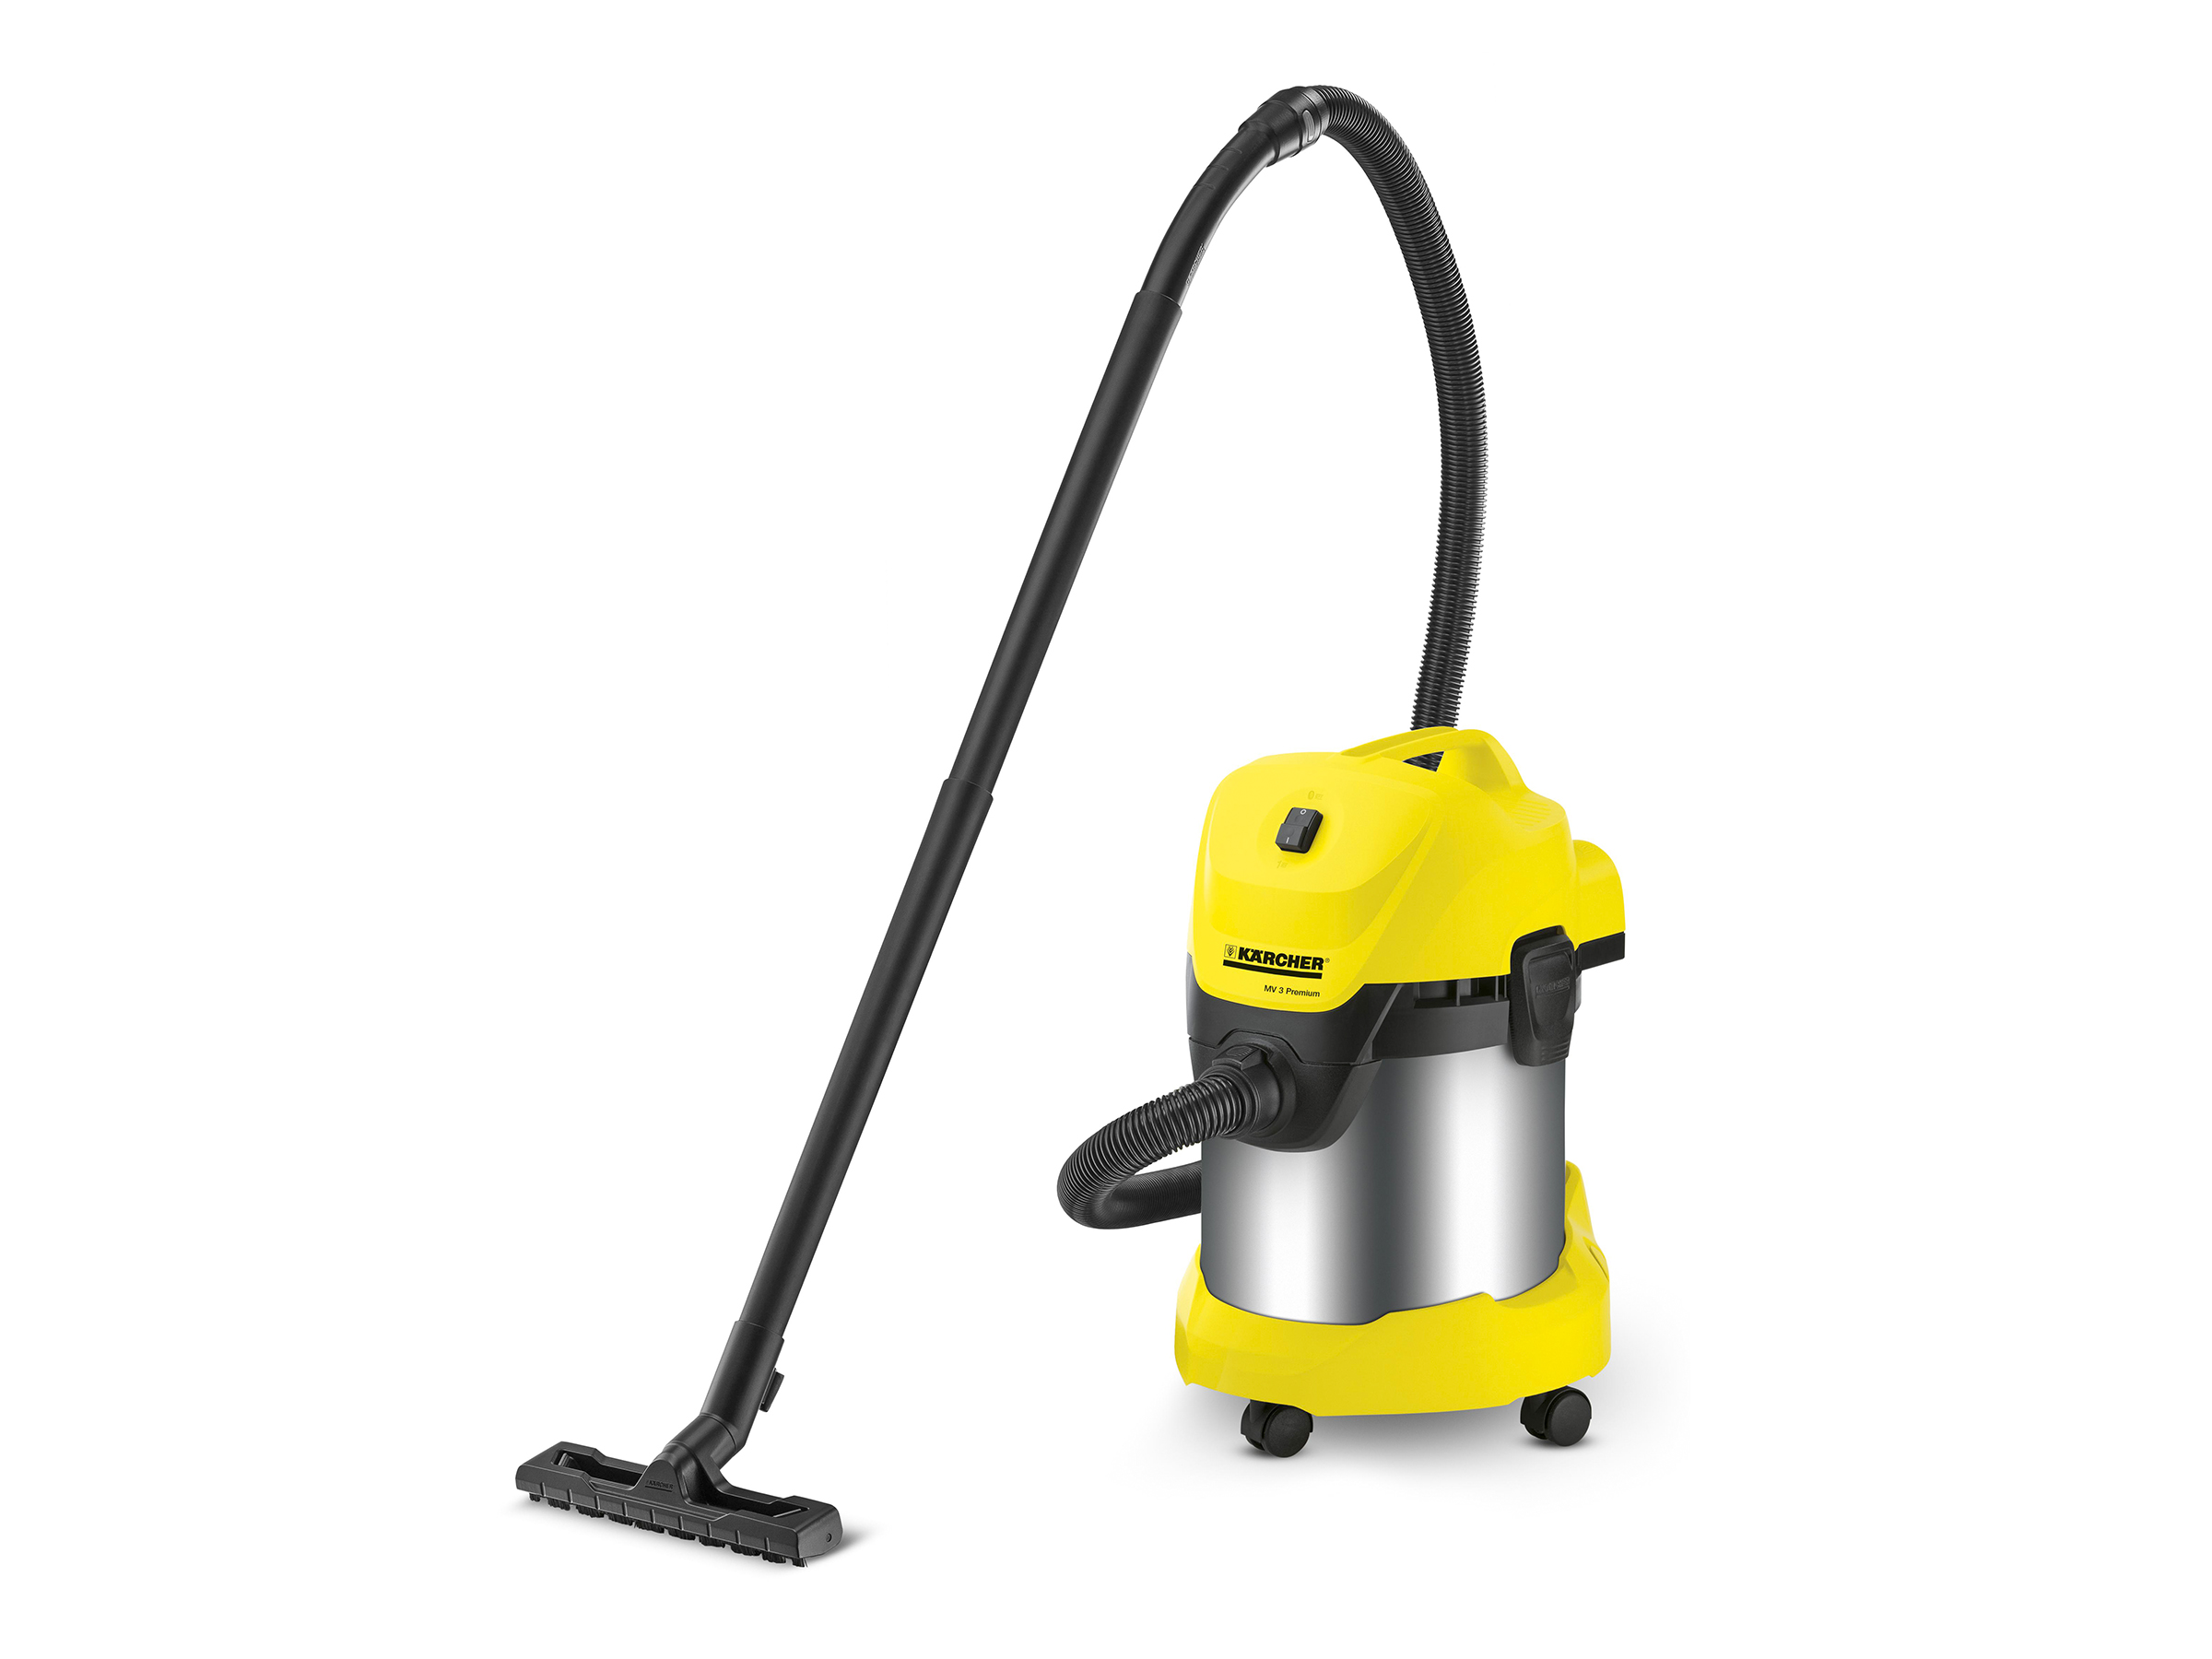 Wd3 Vacuums Tools Premium And Wet Dry Karcher Vacuumamp; lFc3J5TuK1